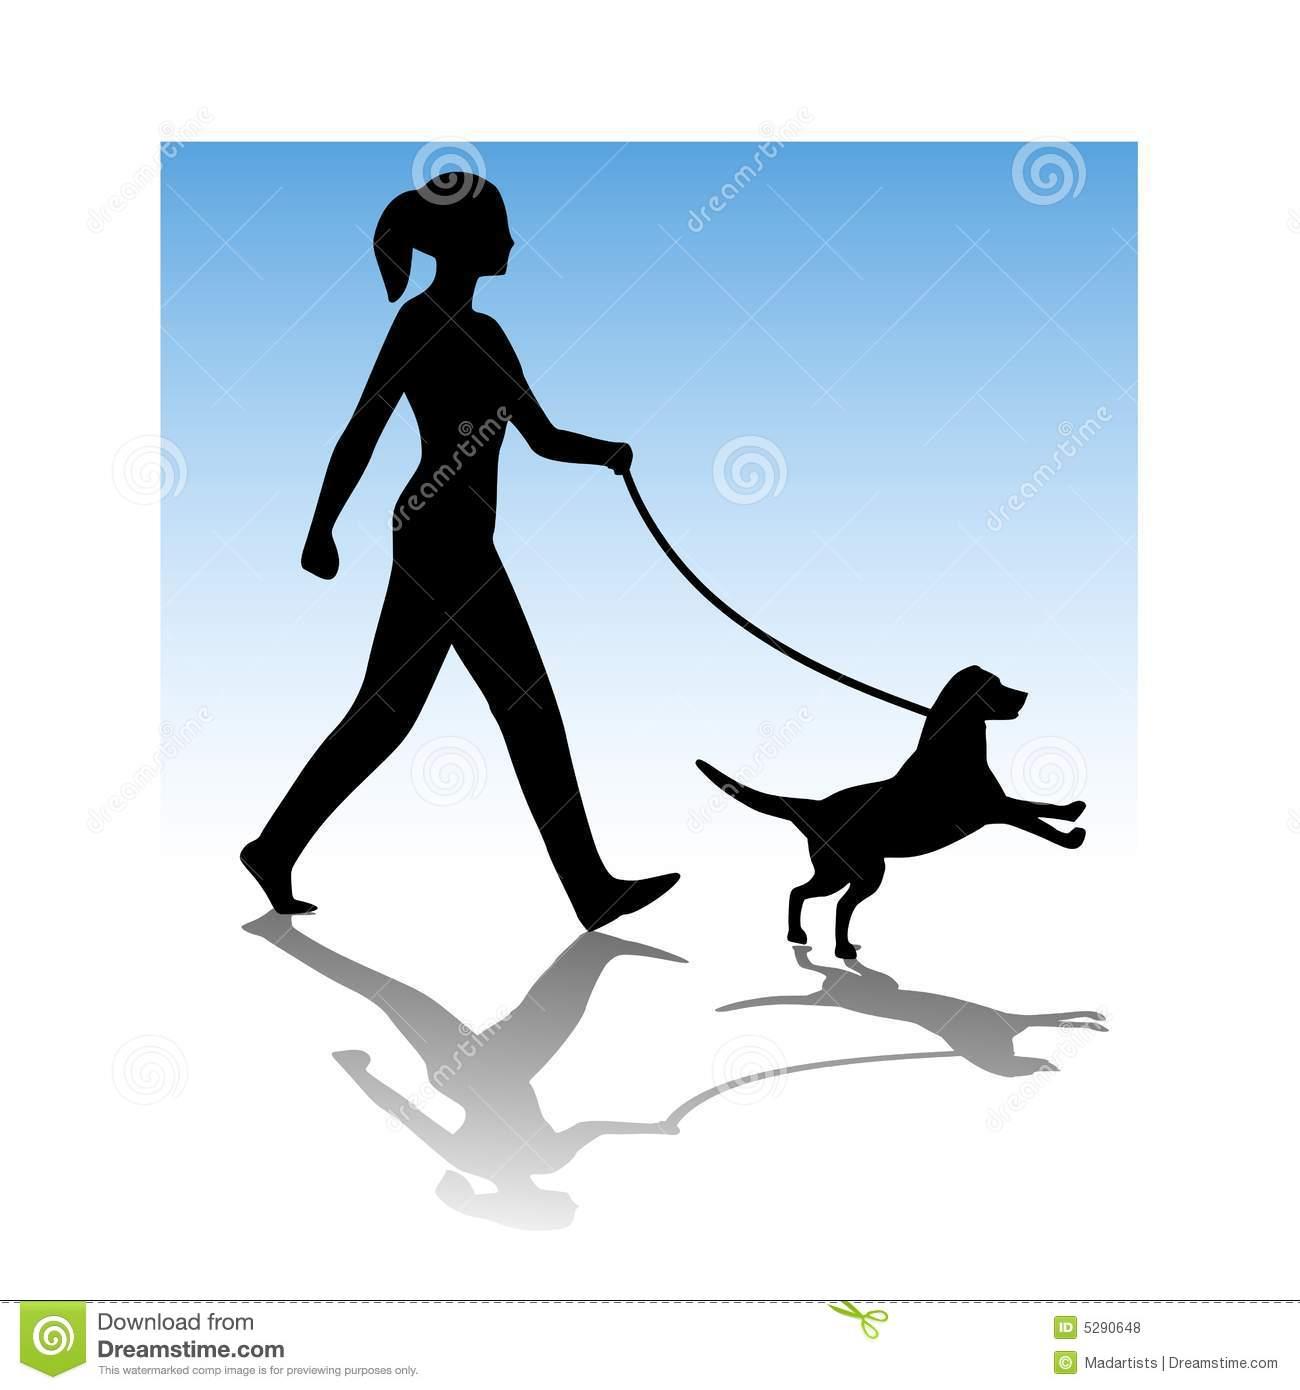 Woman walking dog clipart.